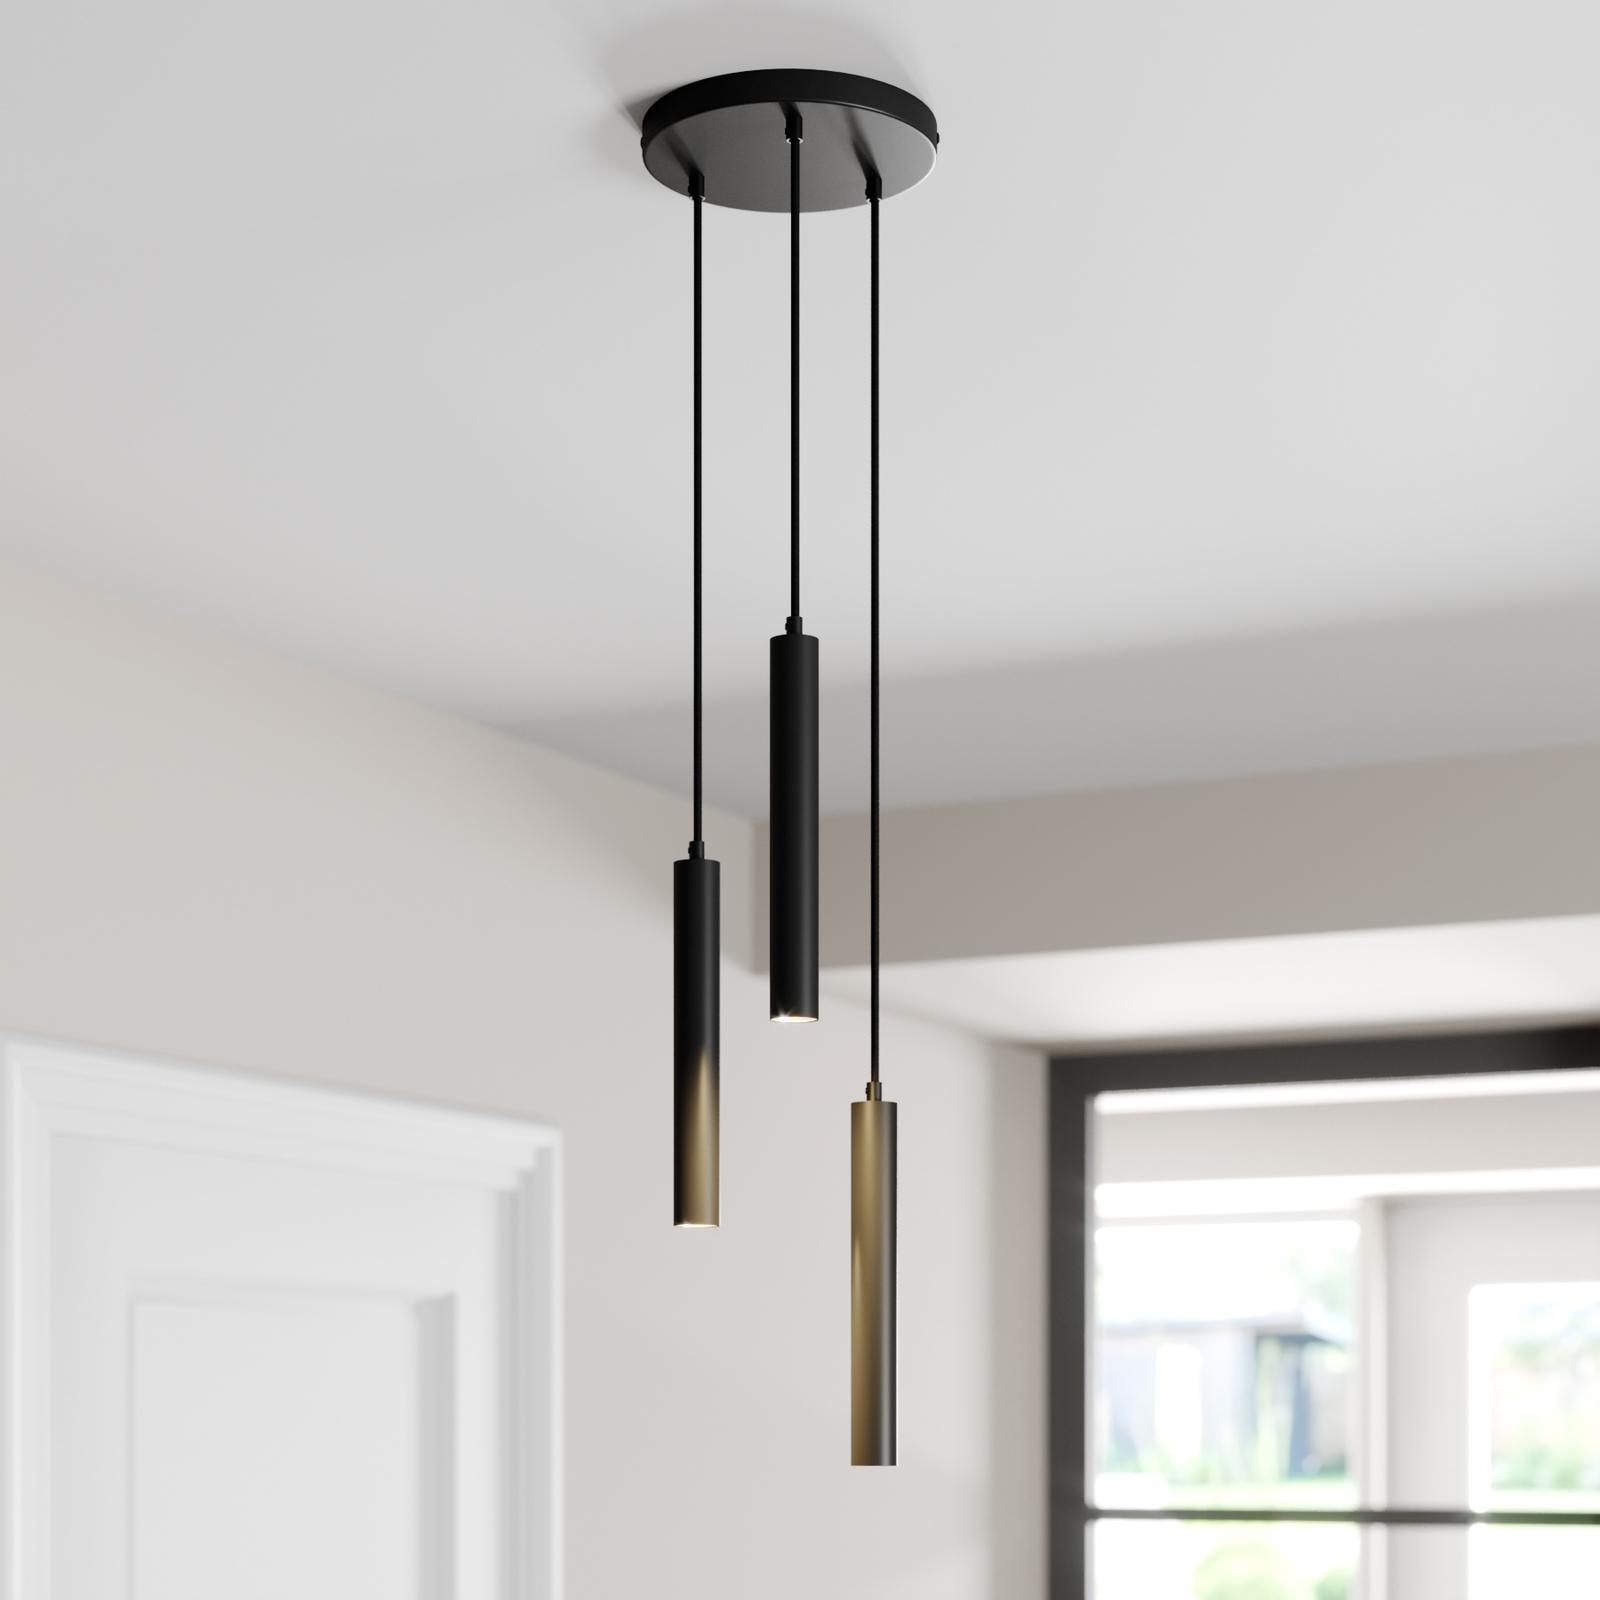 Arcchio Franka LED hanglamp, 3-lamps rond